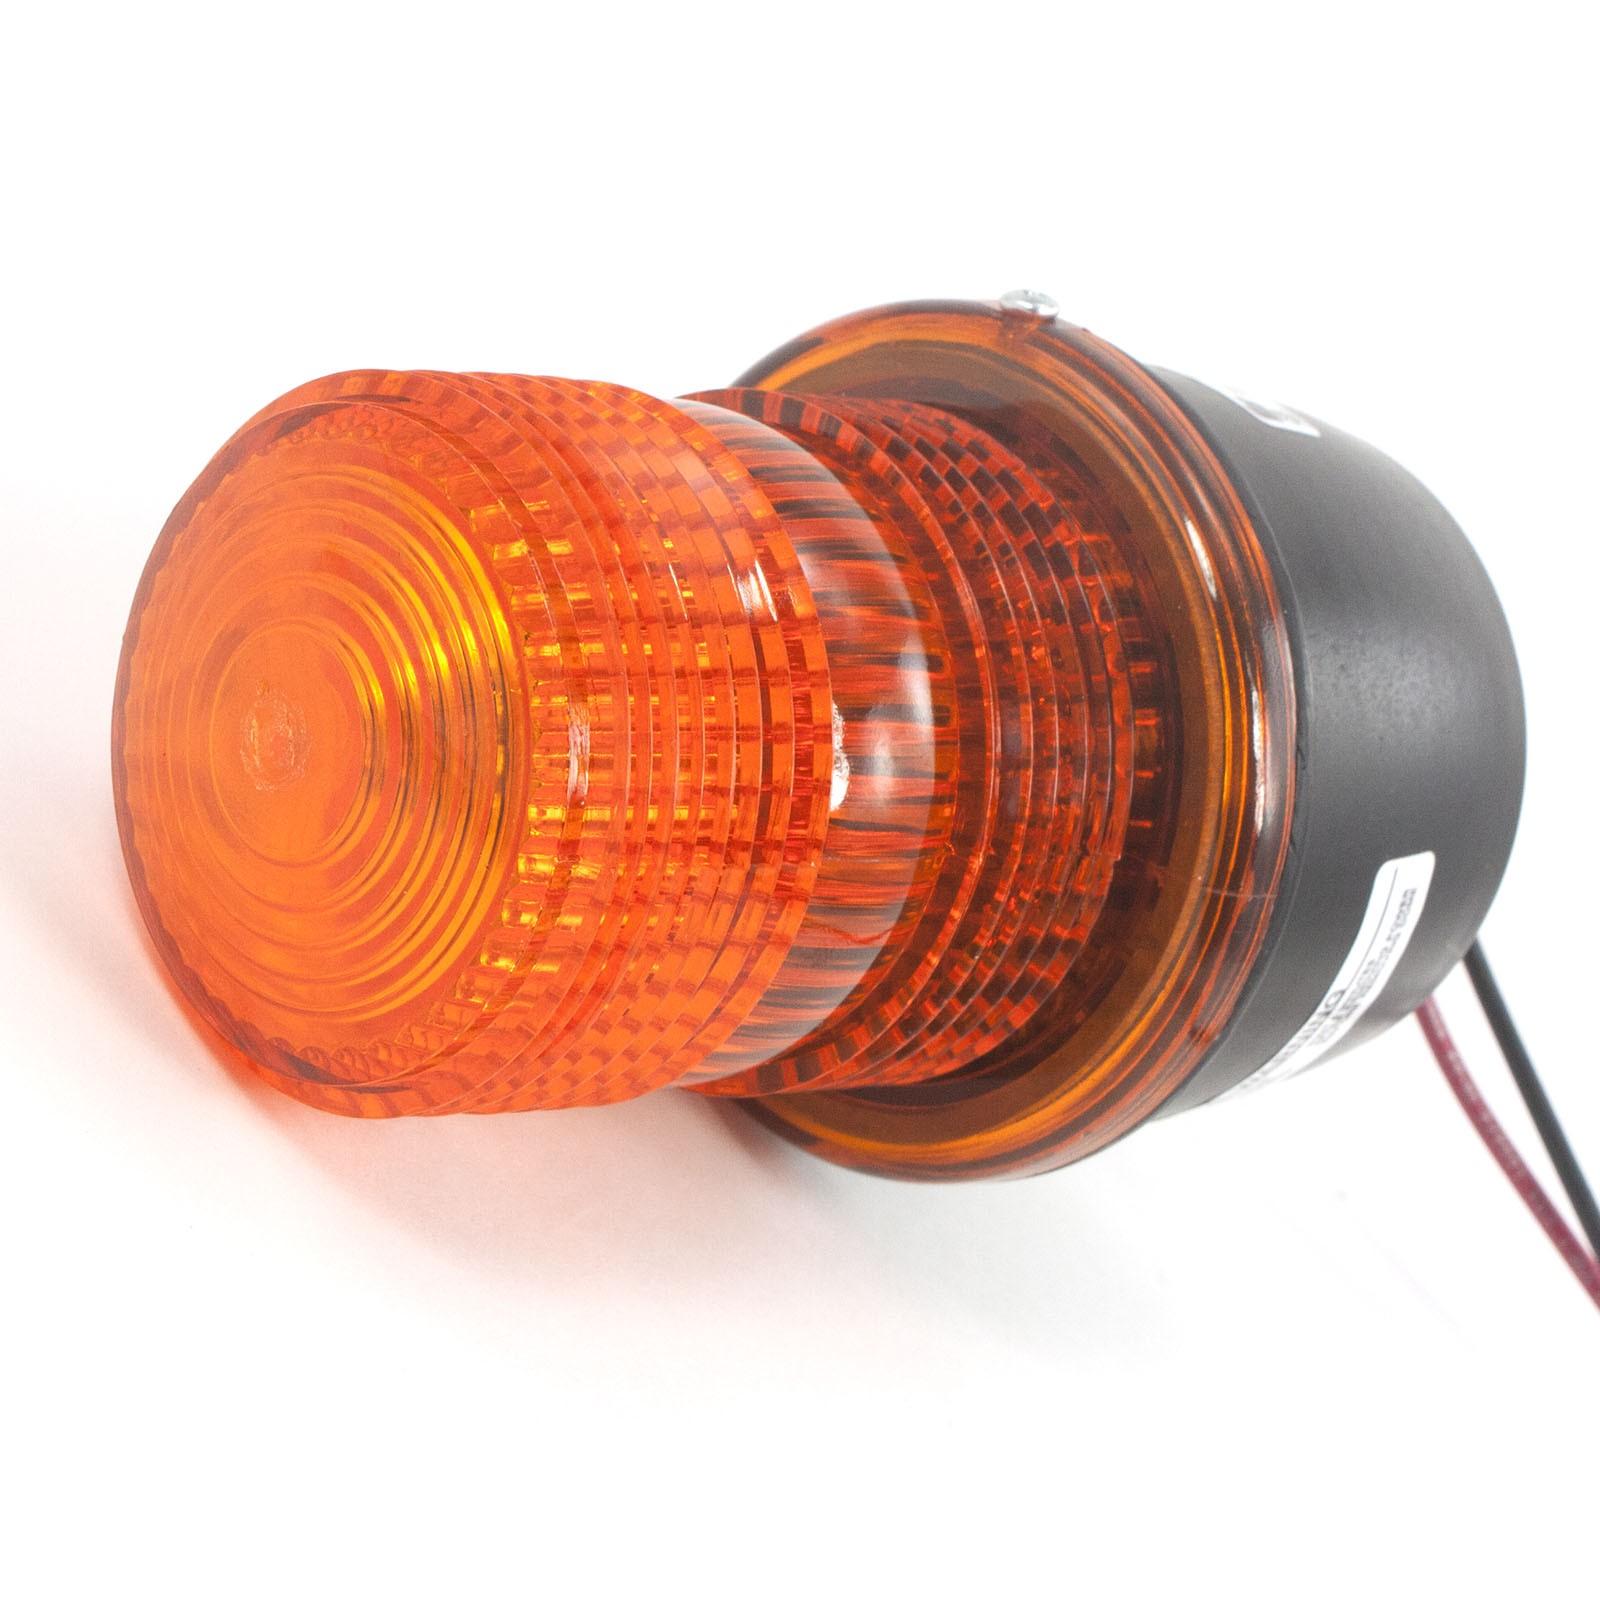 Garage Door Green Light Blinking: Linear Osco 2510-337: Flashing Strobe Signal Light (Amber